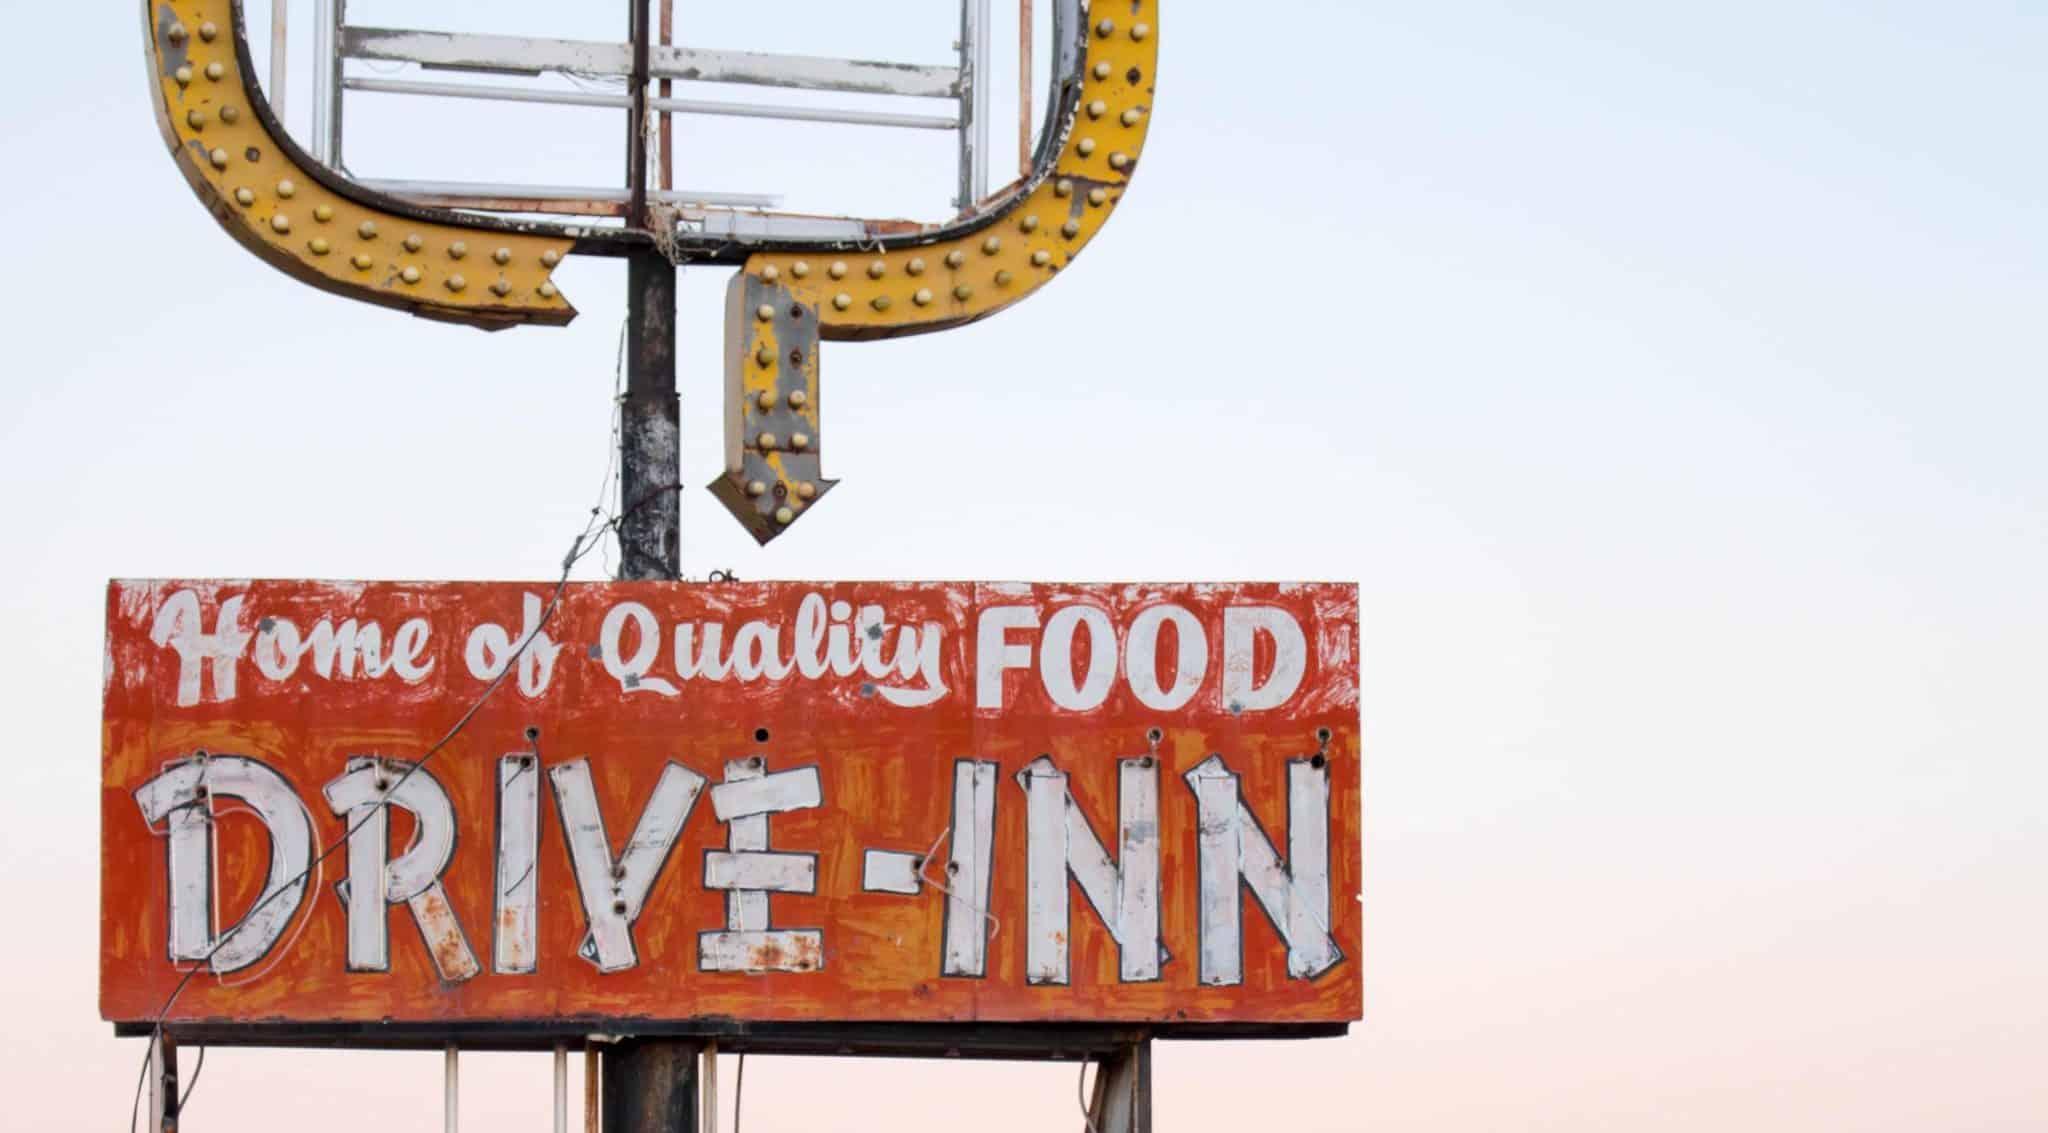 Abandoned Westerner Drive-Inn Along Route 66 in Tucumcari